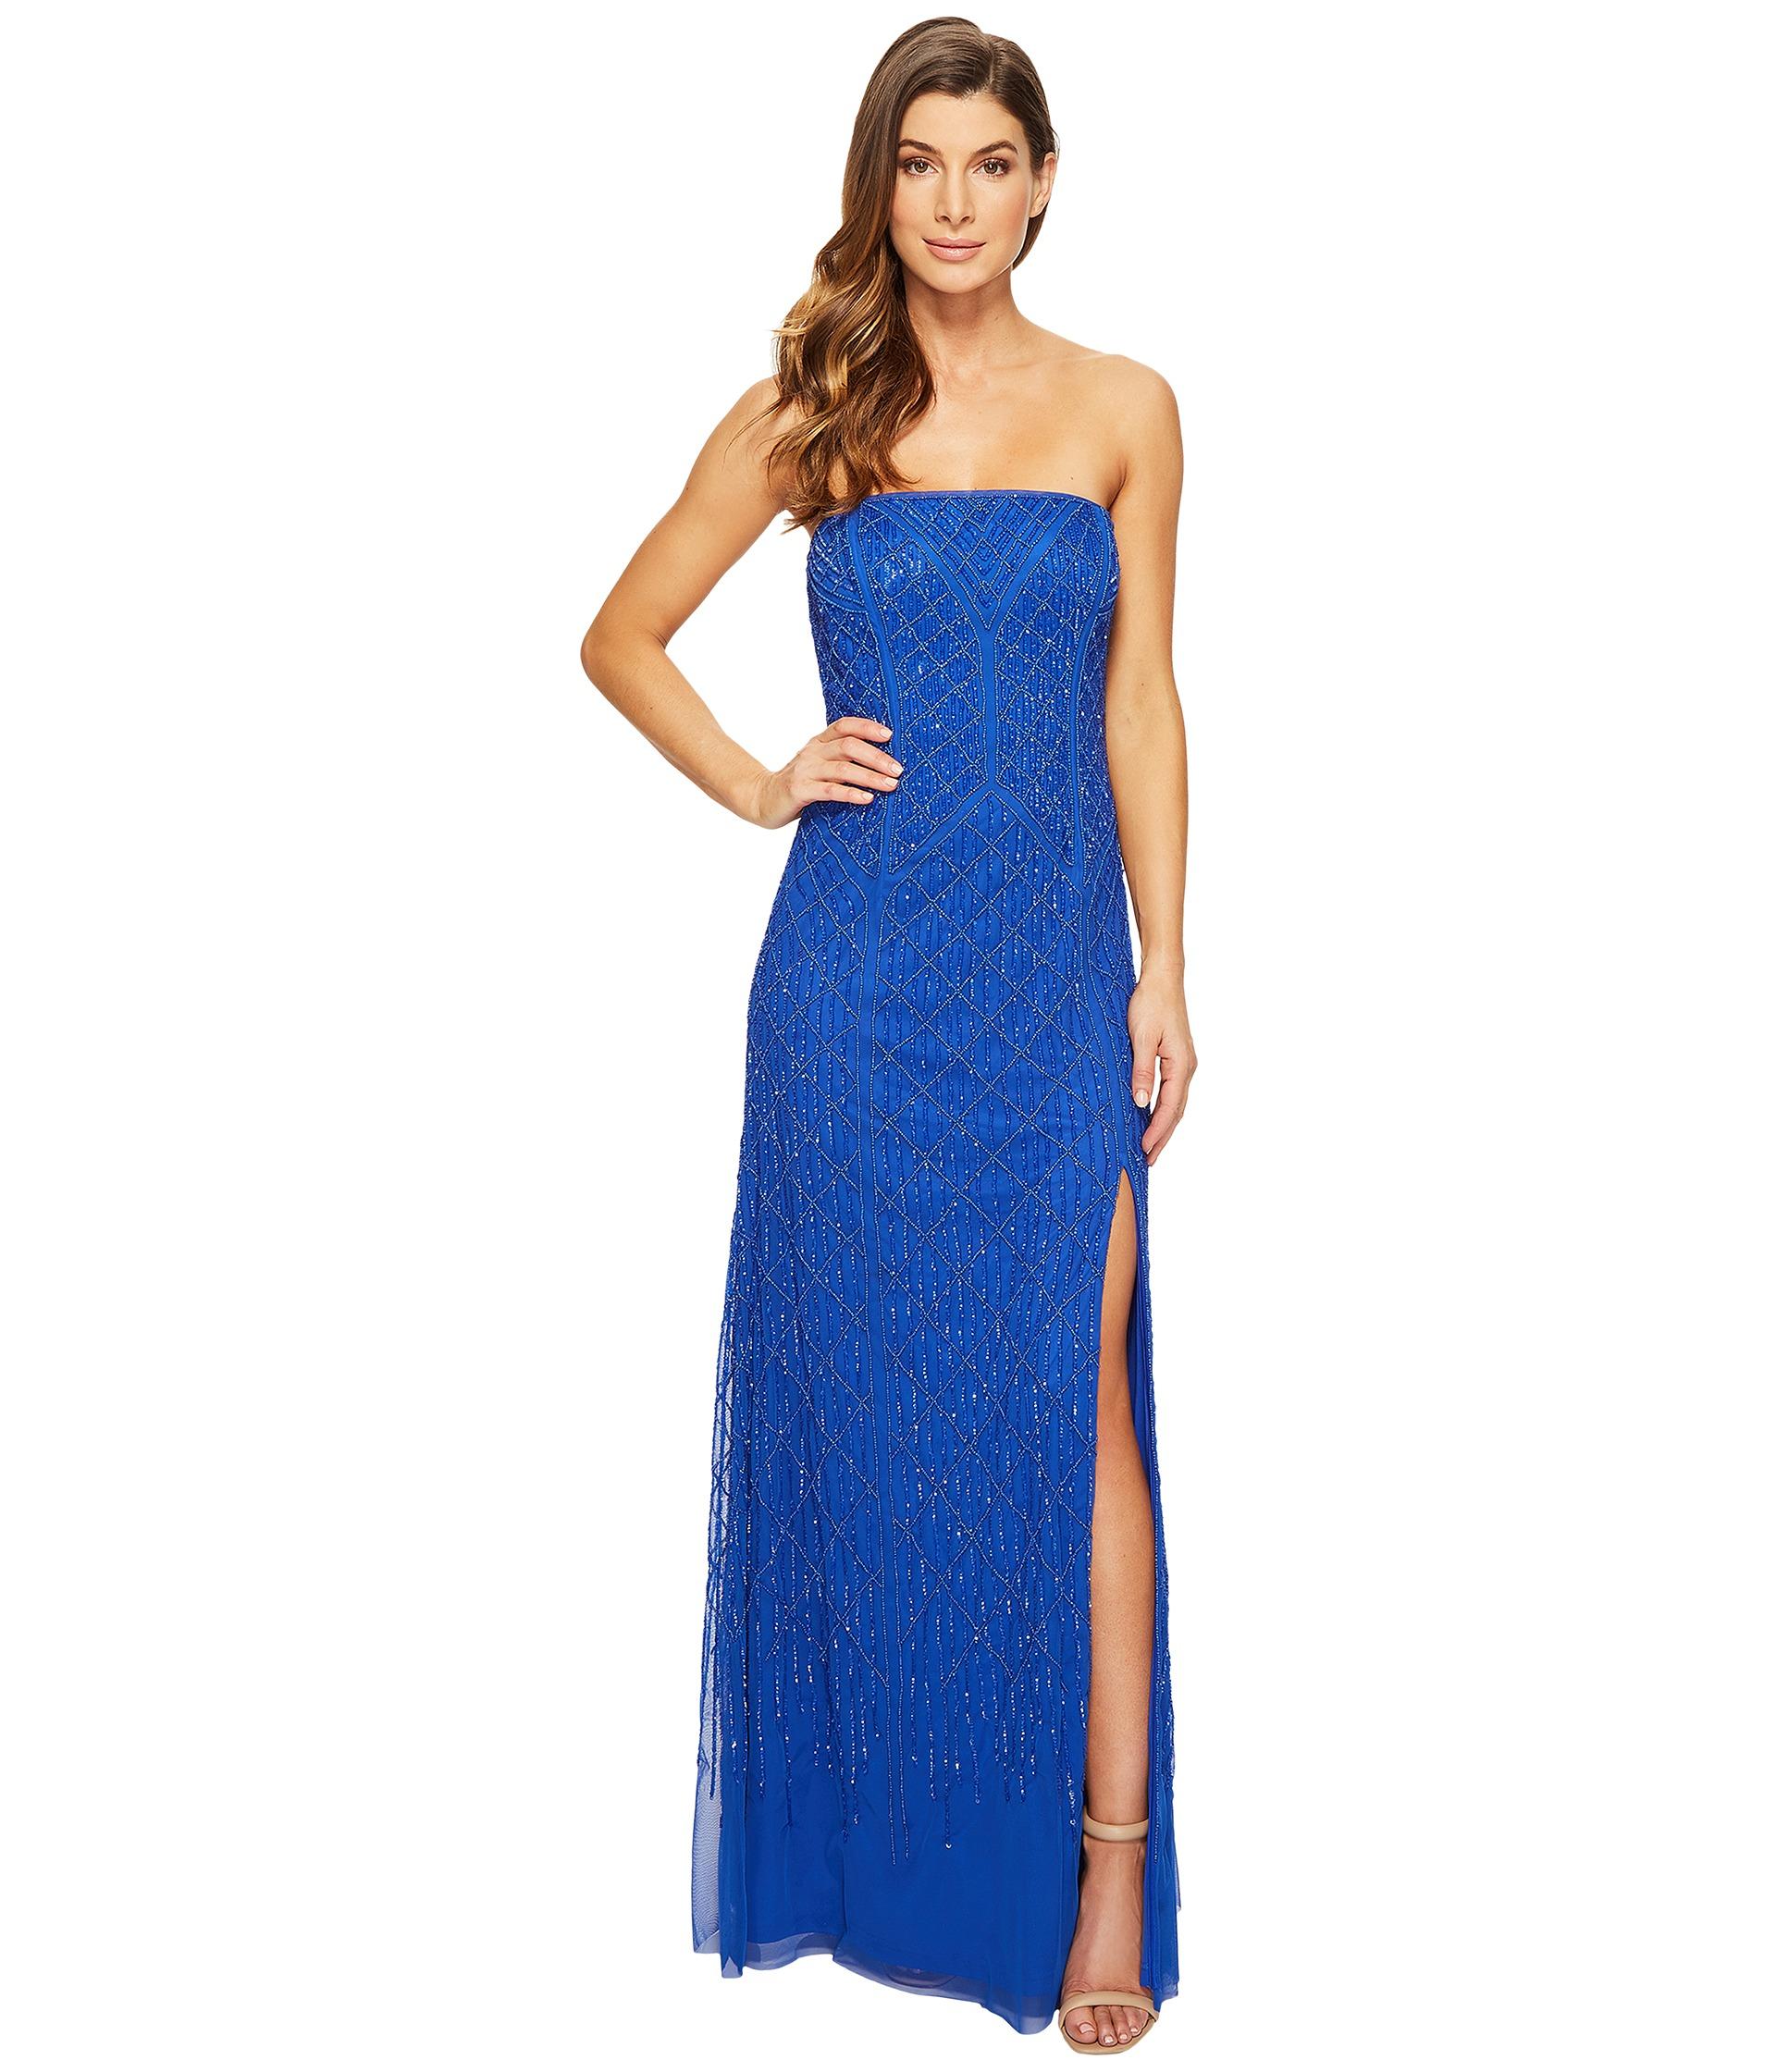 Bcbgmaxazria Kate Sequined Strapless Dress Lilac Mauve Combo ...